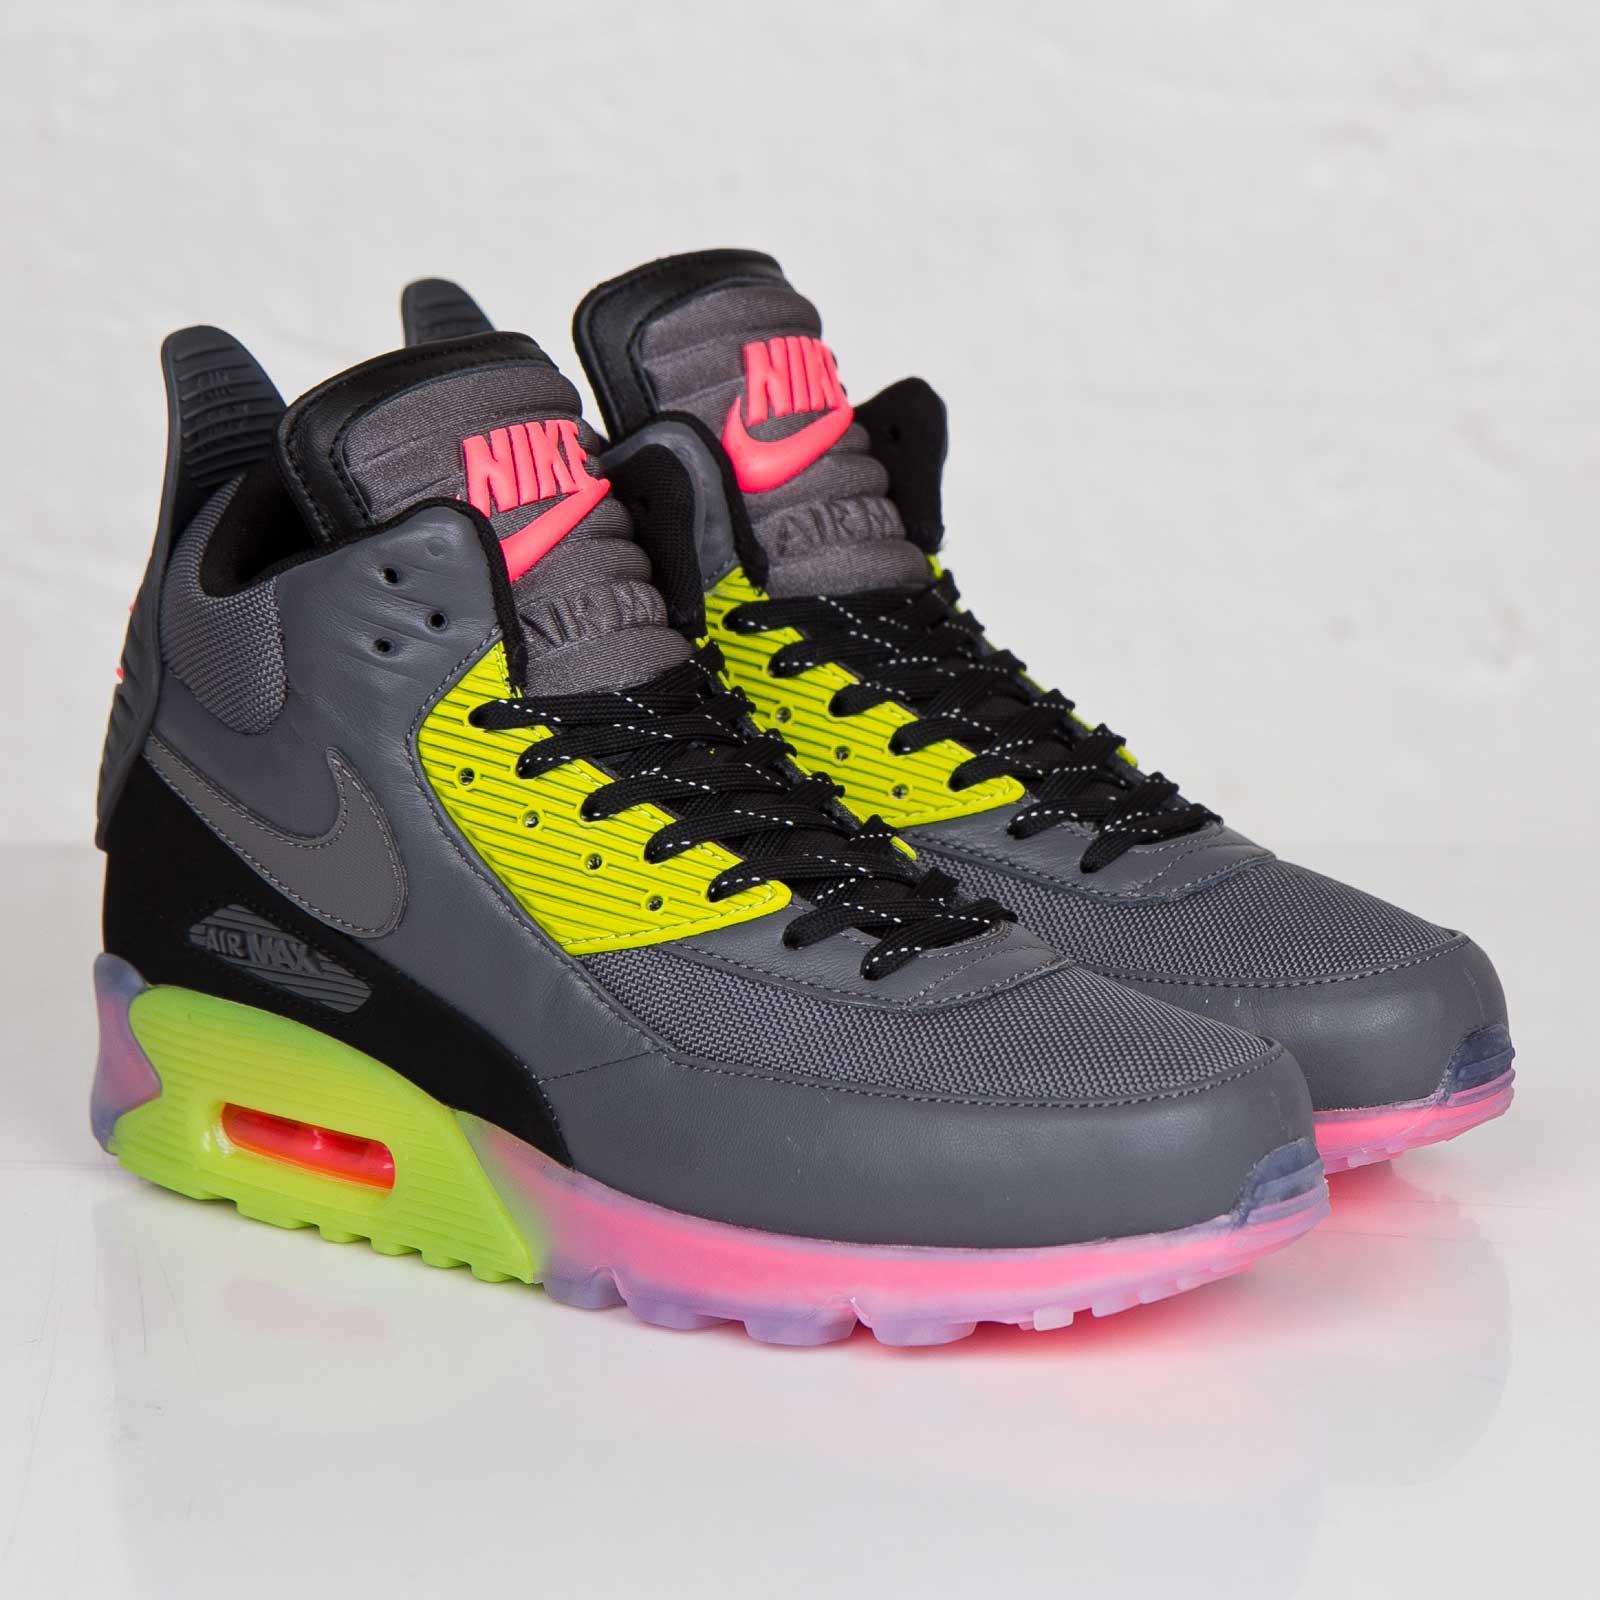 5062e61c7e95 Nike Air Max 90 Sneakerboot Ice - 684722-002 - Sneakersnstuff ...